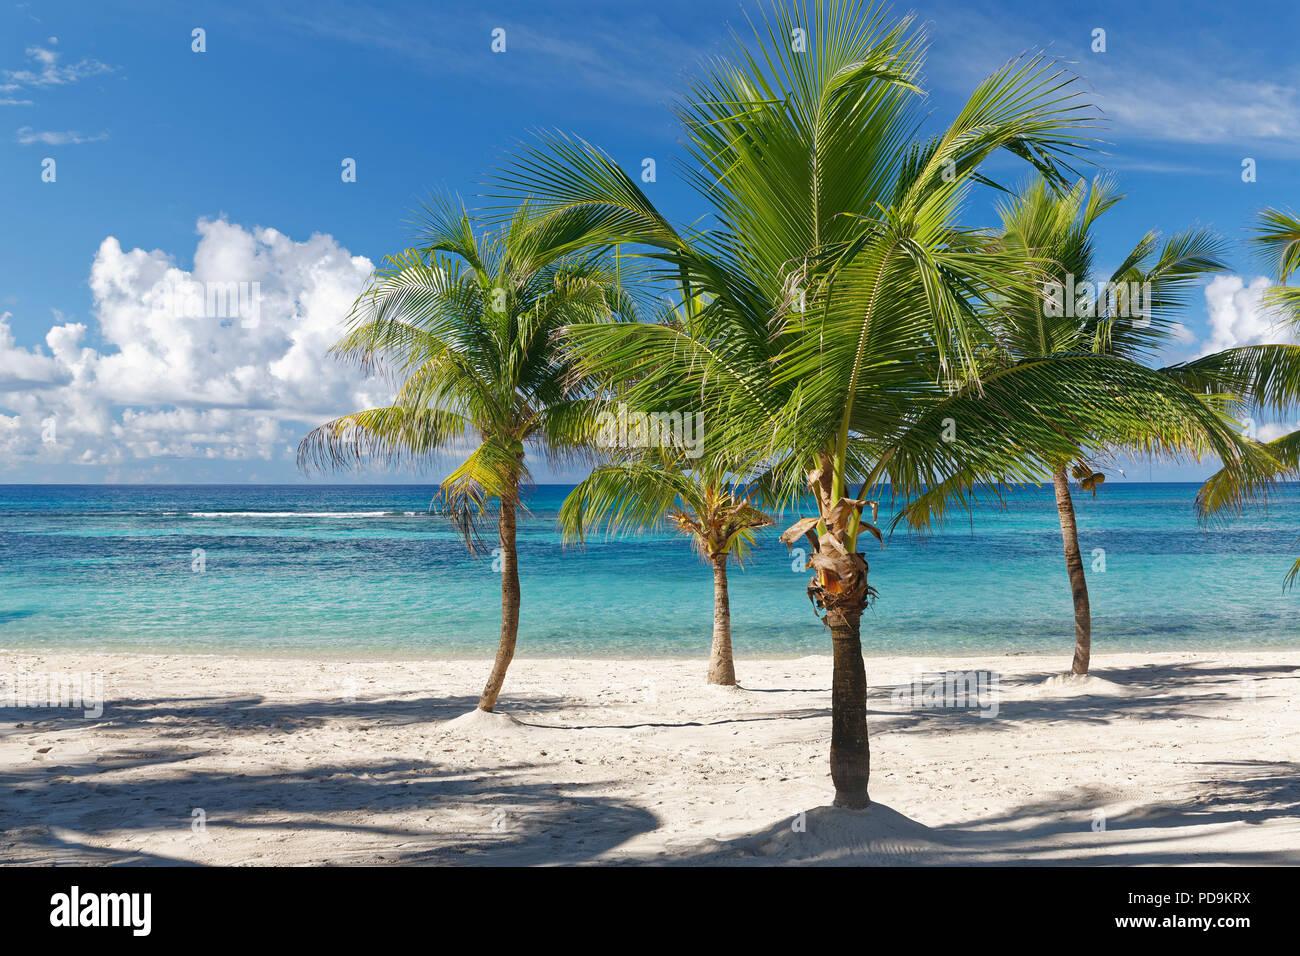 Beach Dream, Sandstrand mit Palmen und türkisblaues Meer, Parque Nacional del Este, die Insel Saona, Karibik, Dominikanische Republik Stockbild